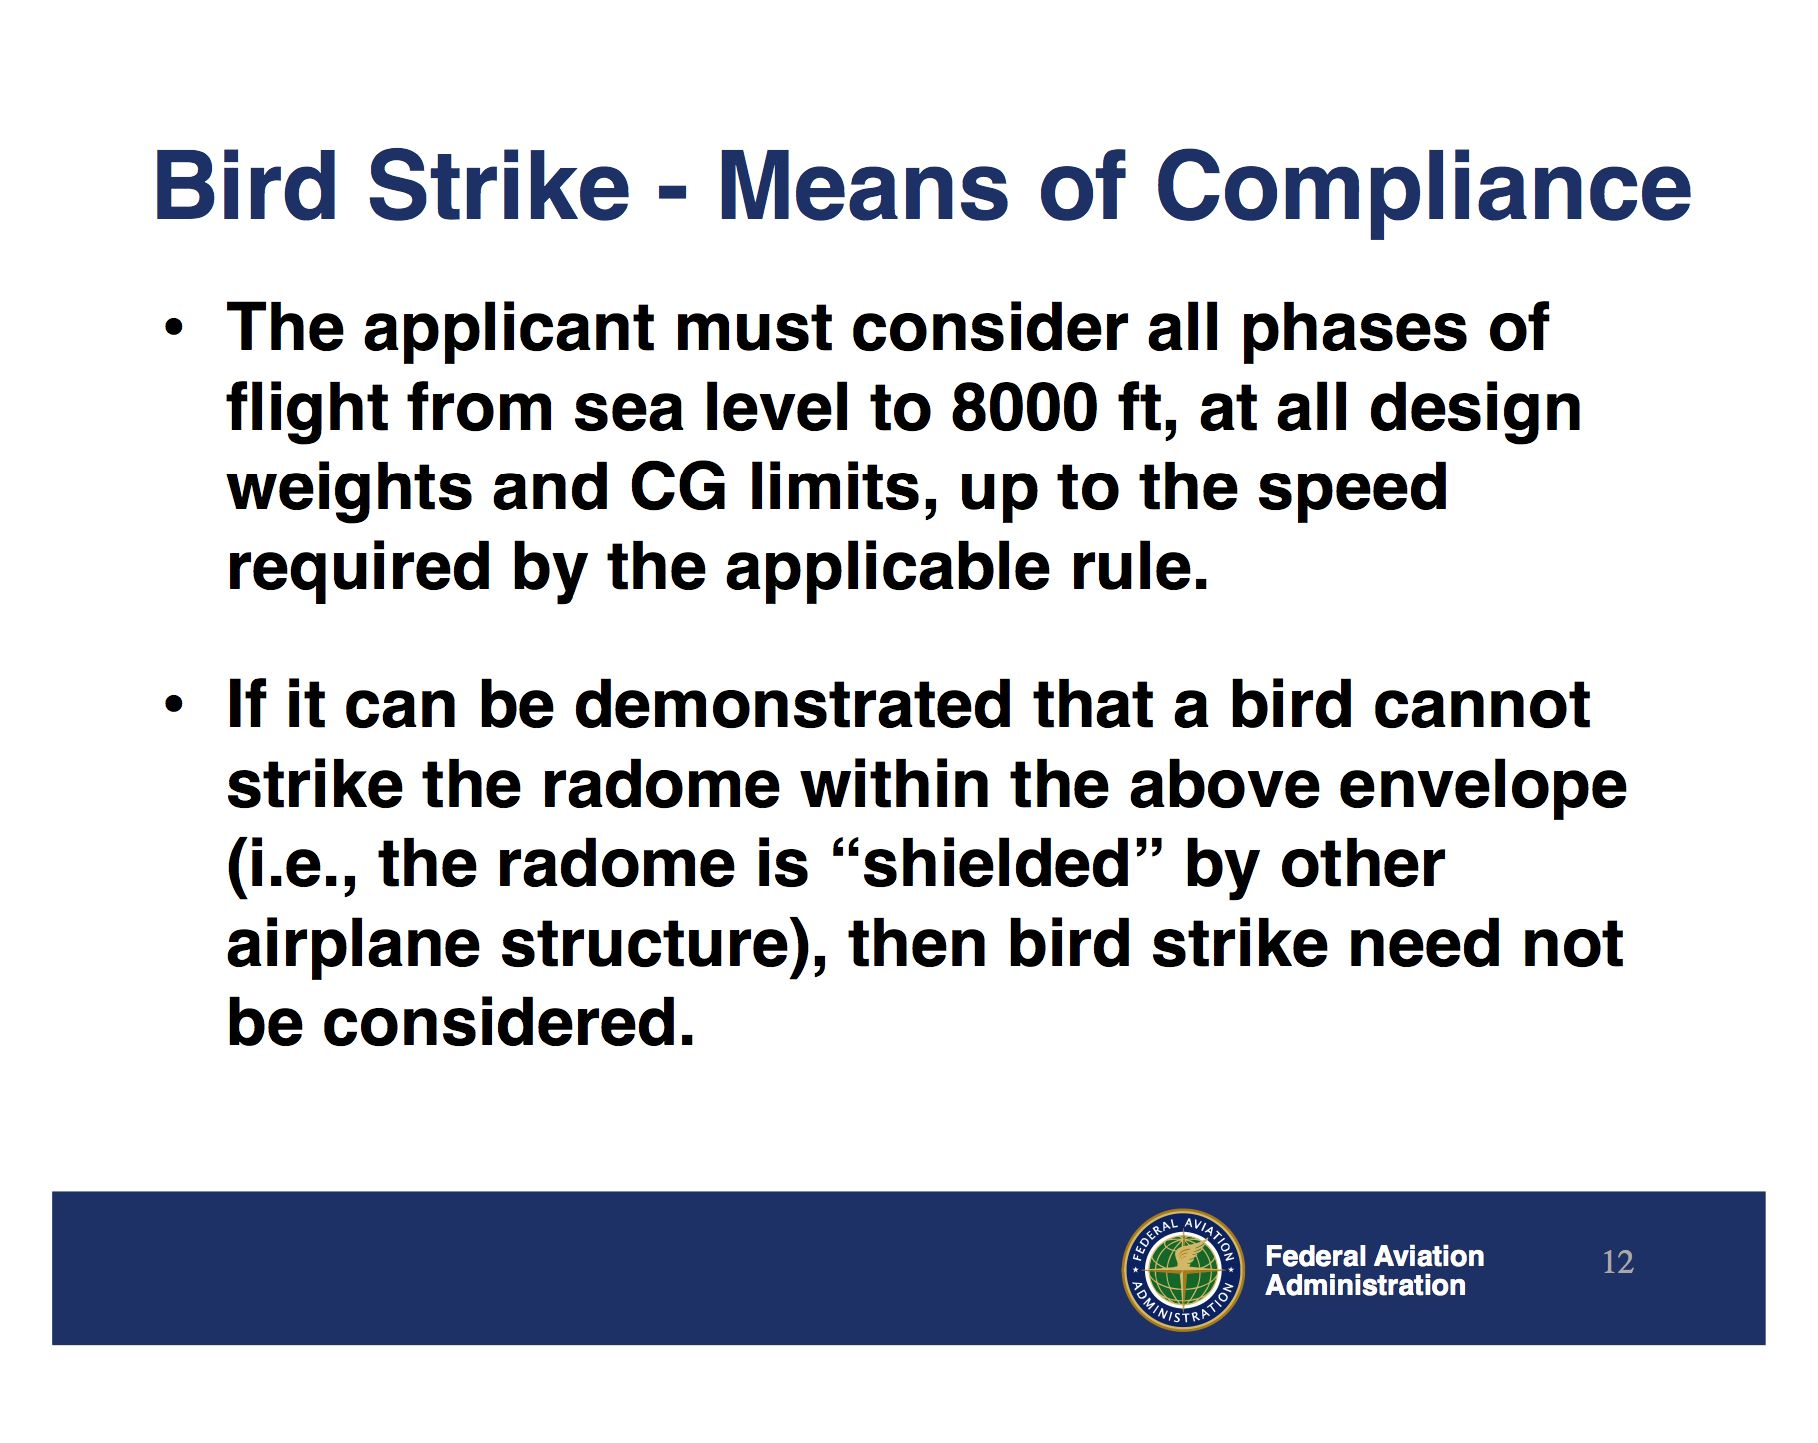 Bird strike fears big enough to warrant serious FAA